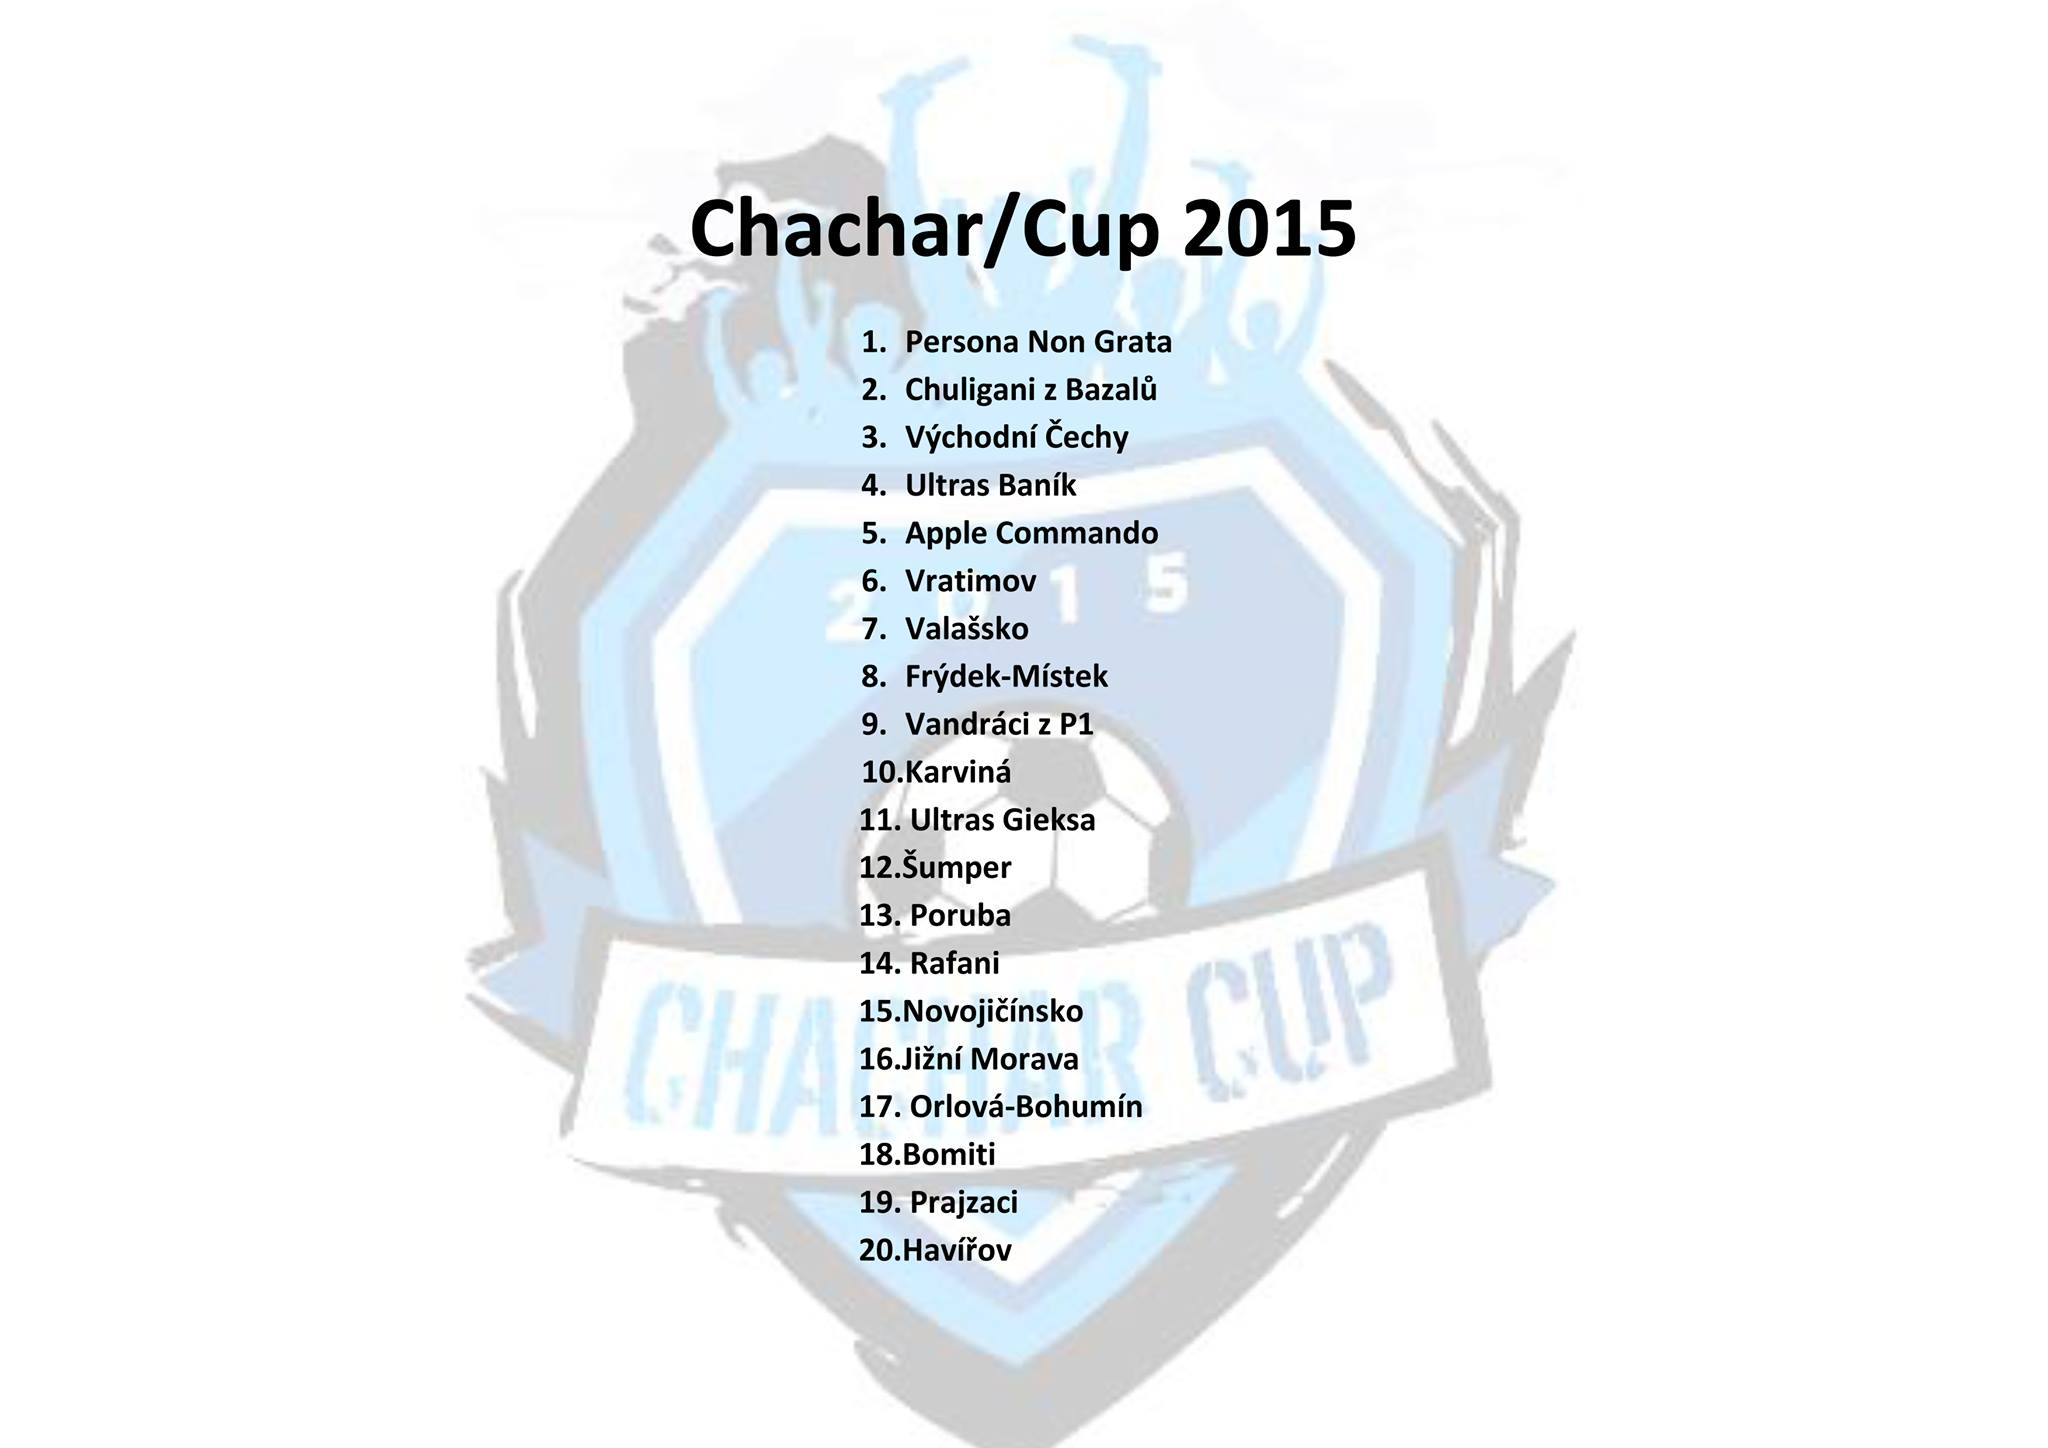 chacharcup_2.jpg (108 KB)